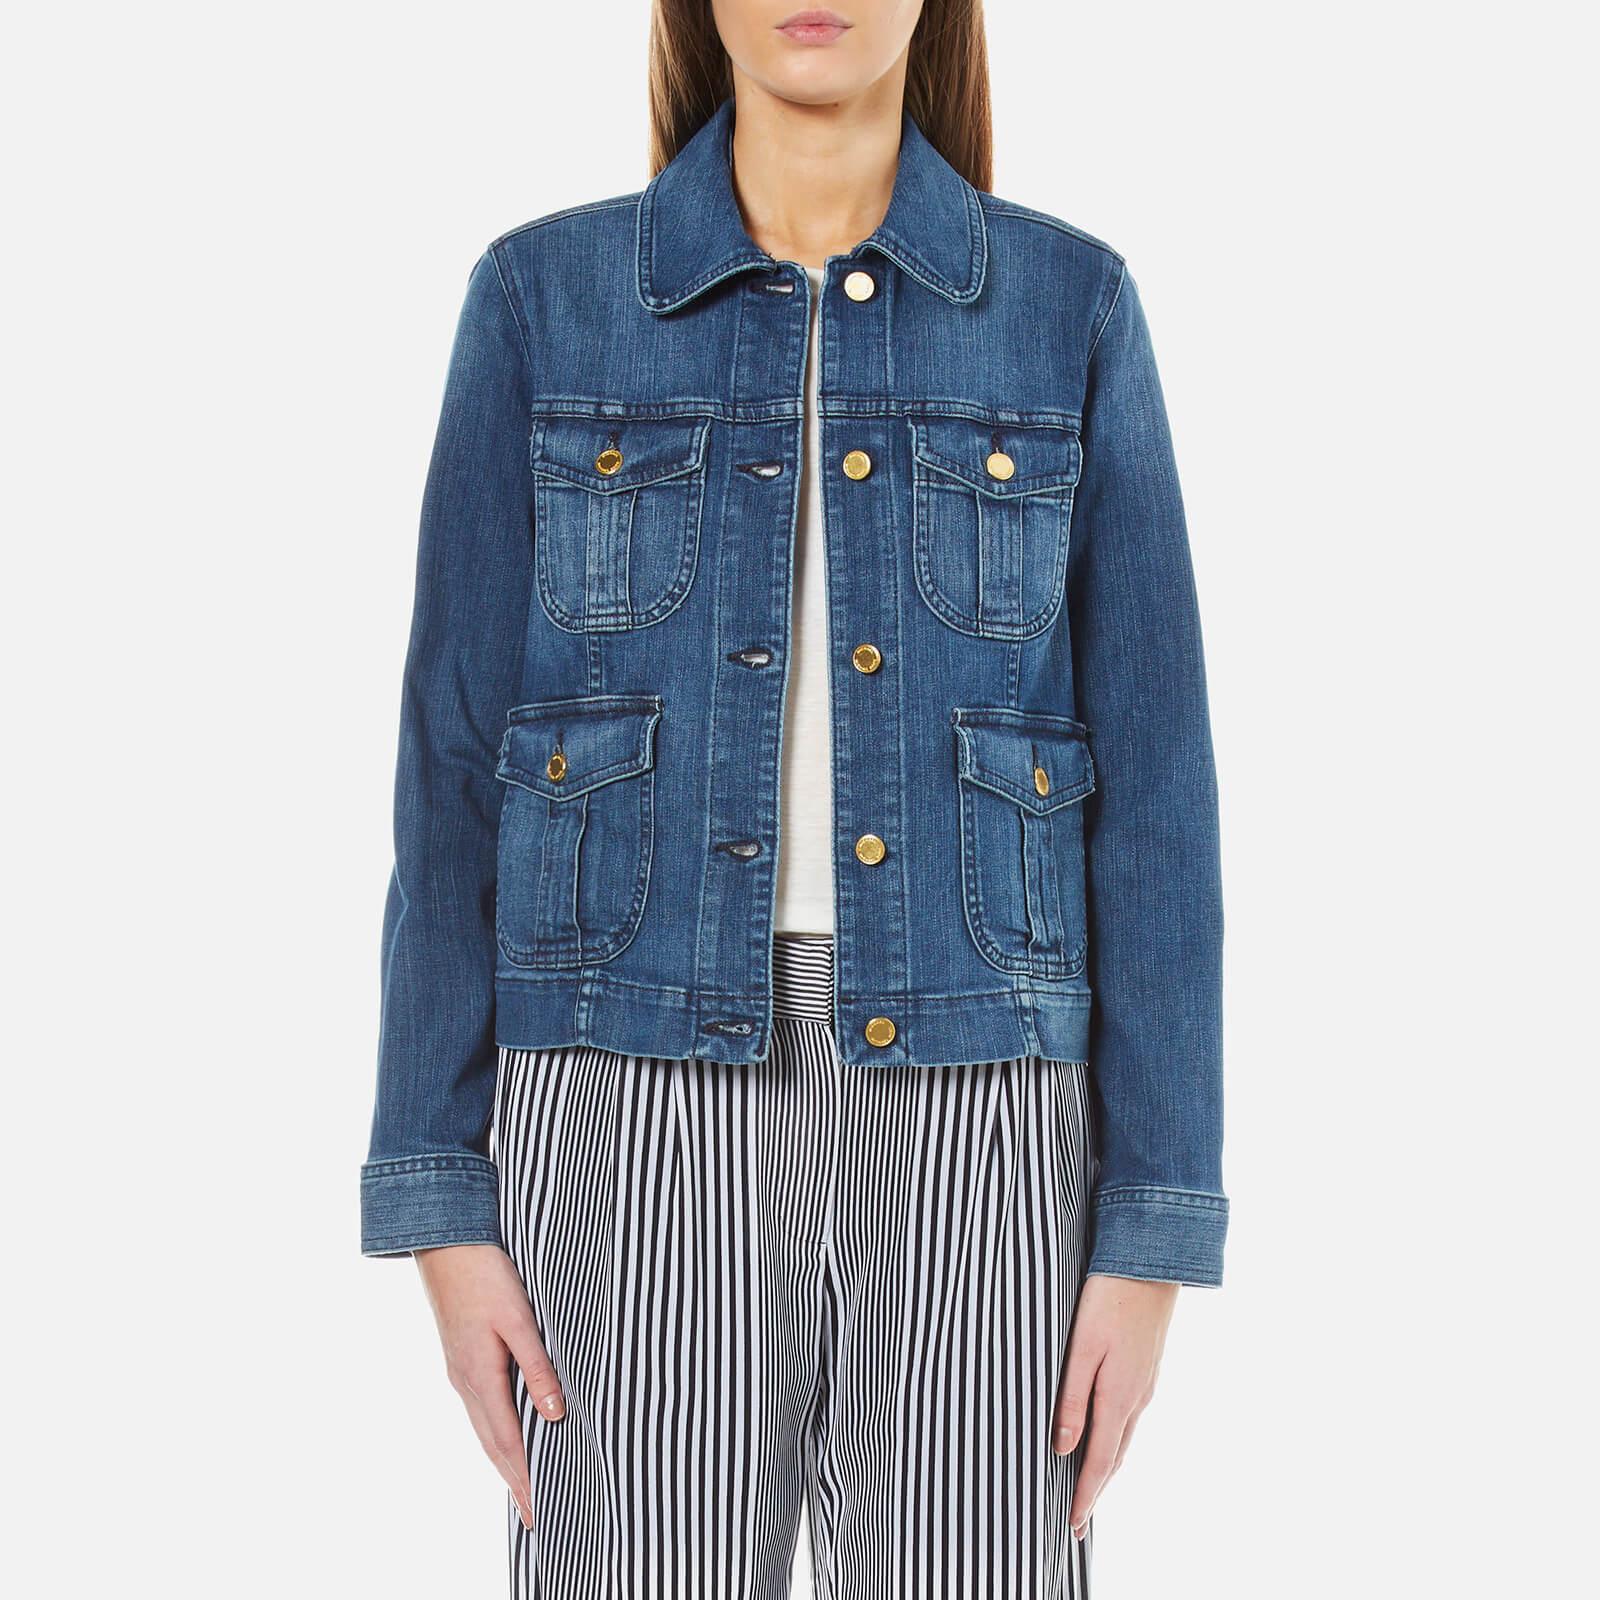 115ab271dc MICHAEL MICHAEL KORS Women s Cargo Pocket Jacket - Vintage Blue Wash ...